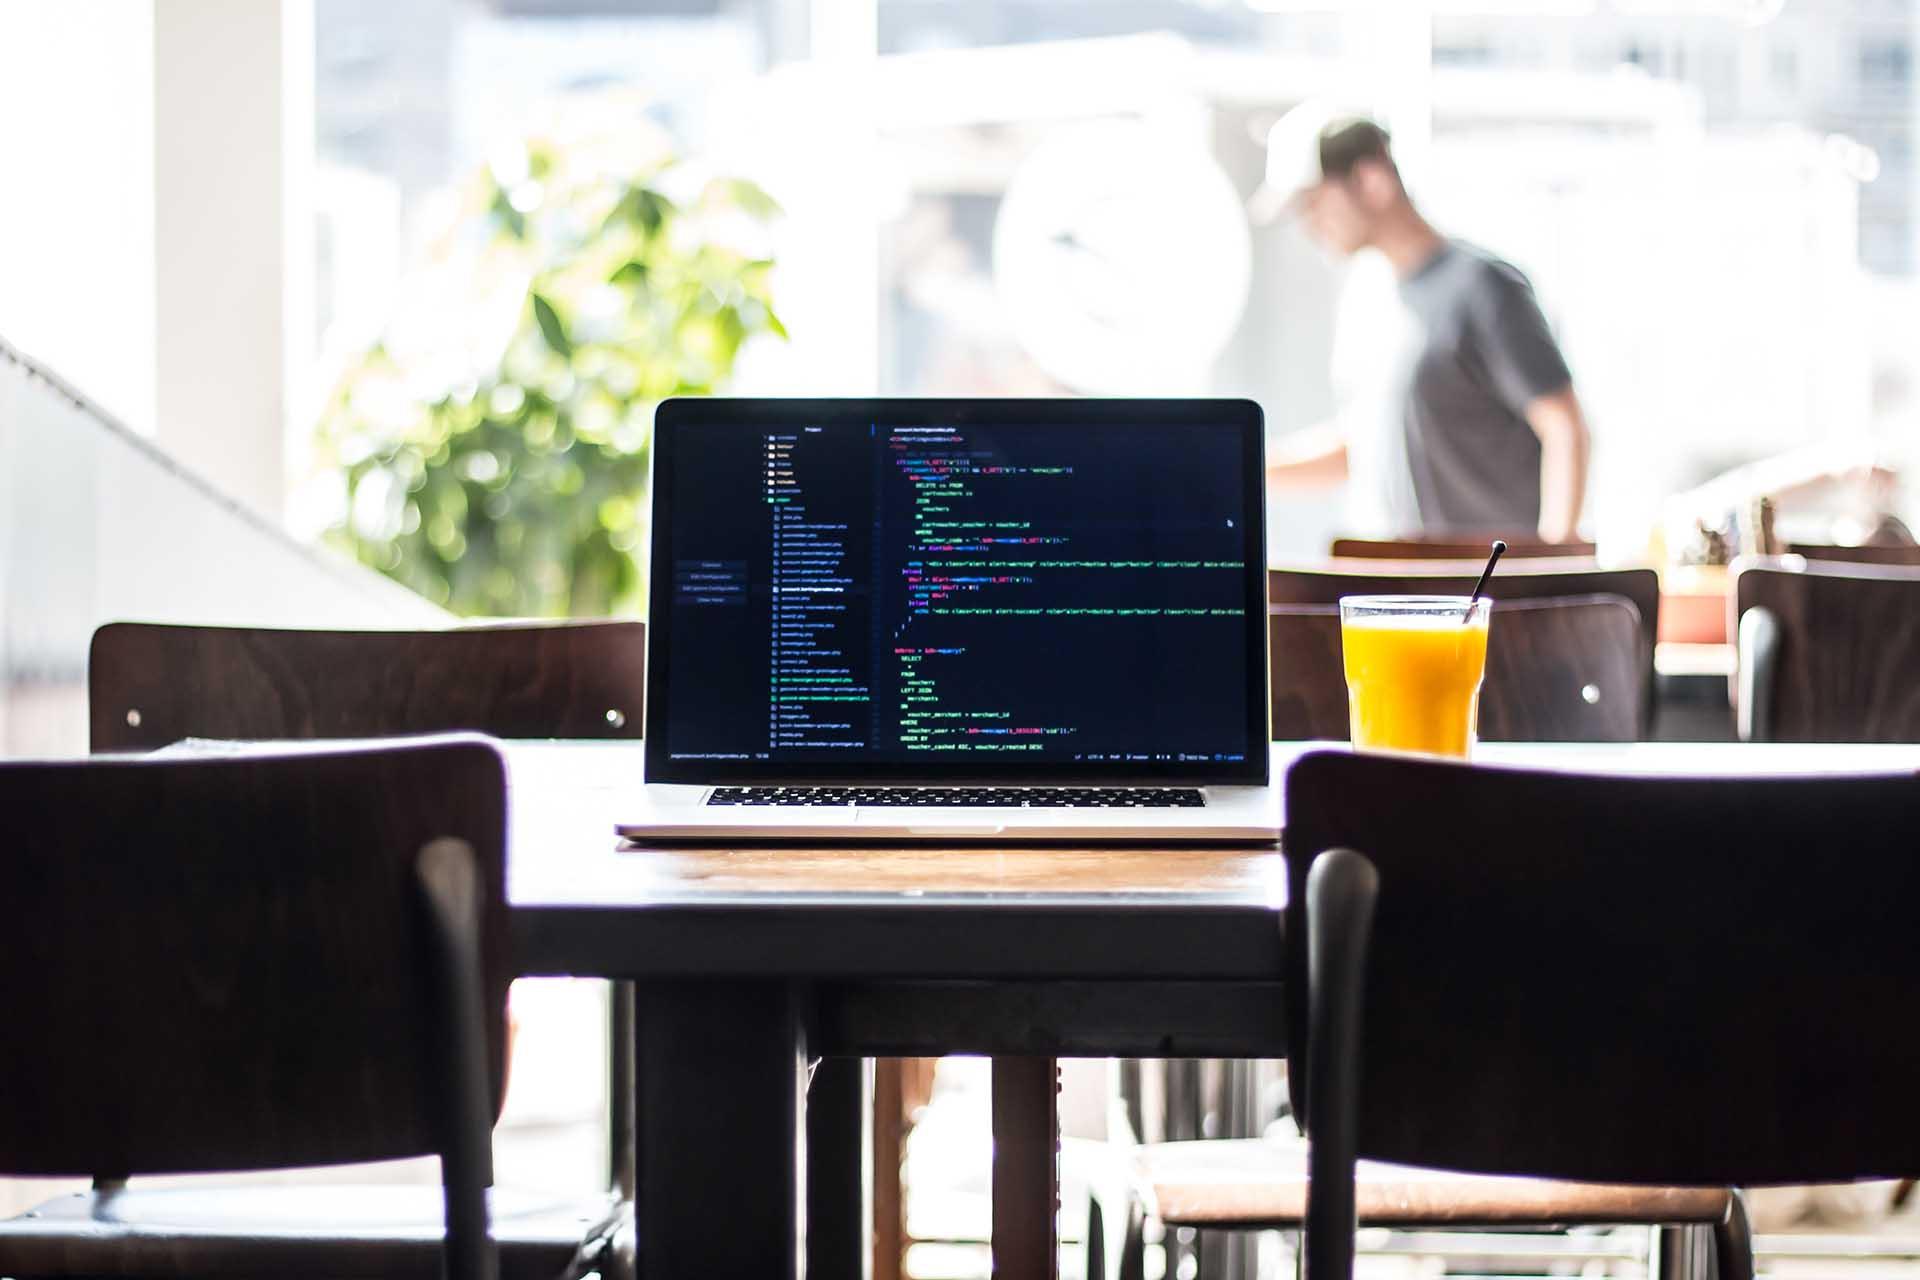 t2informatik Blog: Performance Optimisation for WPF Applications